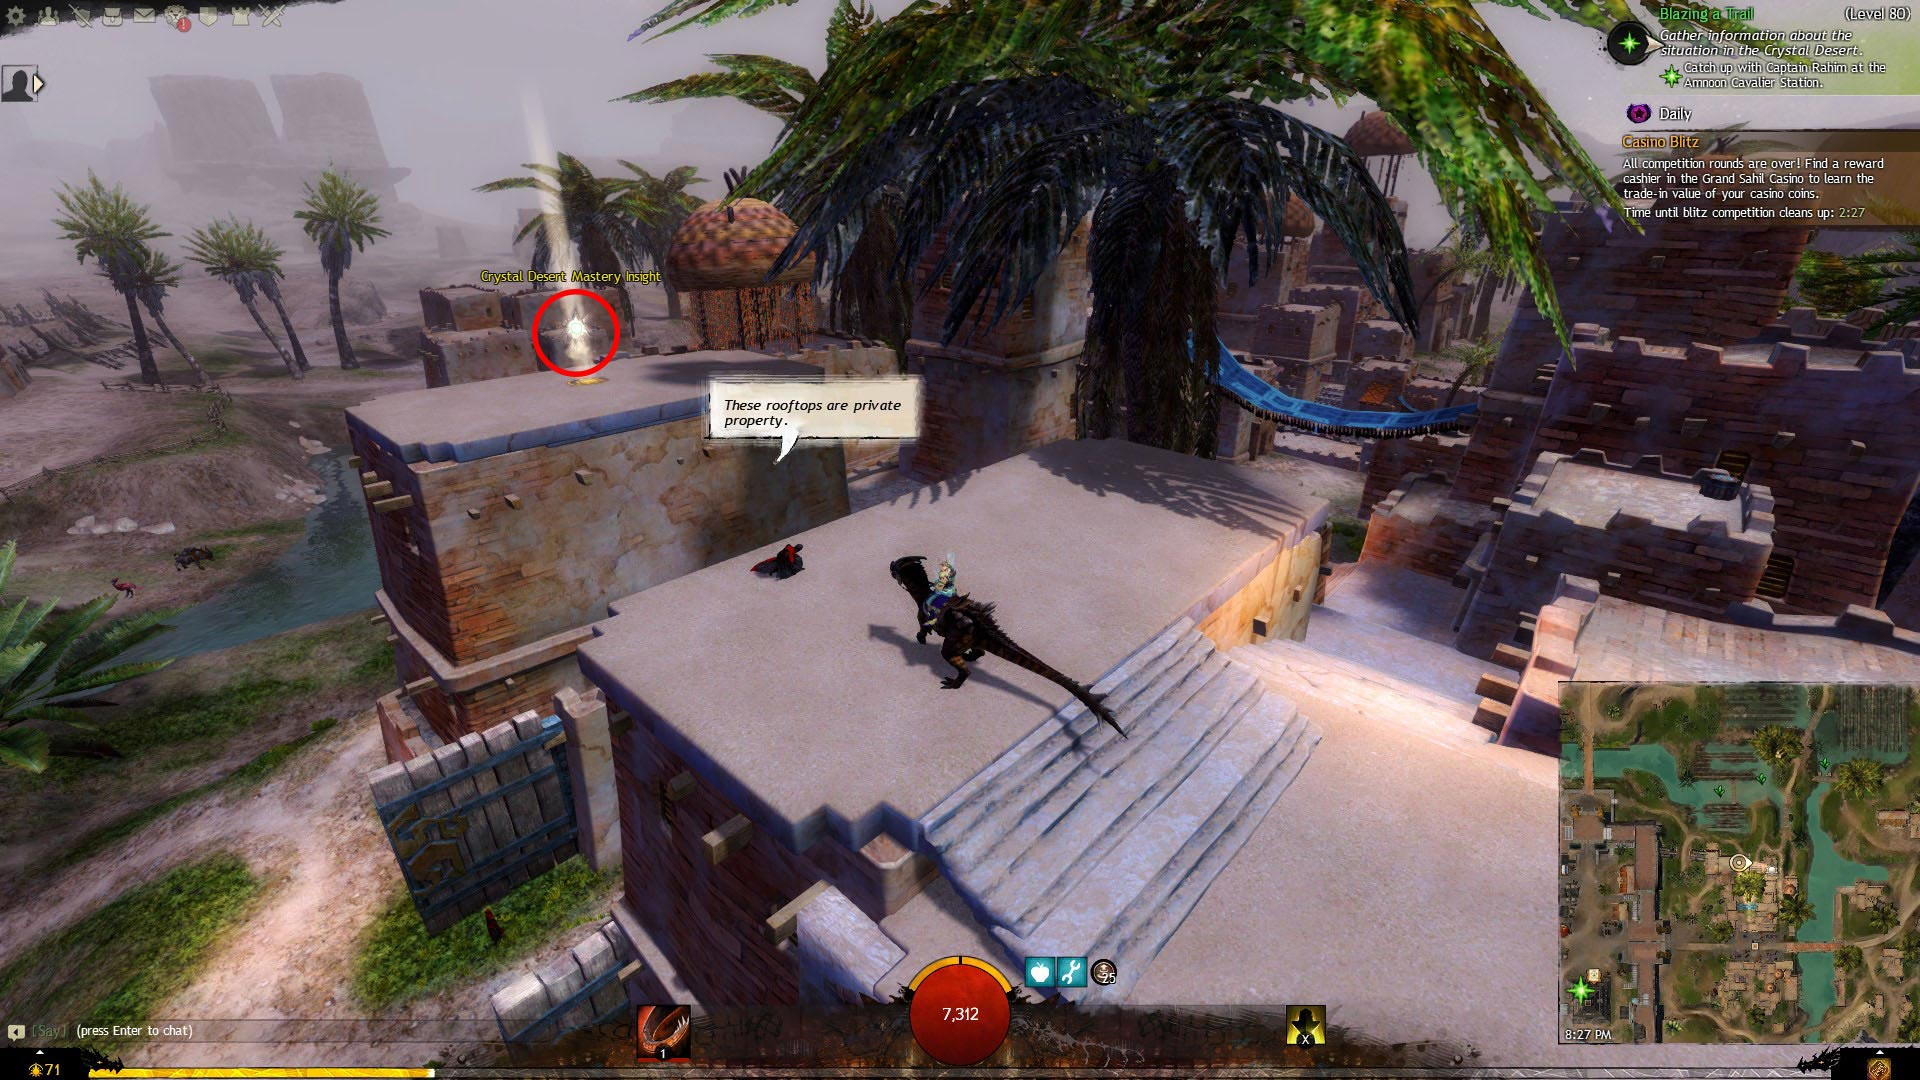 GW 2 Crystal Desert Mastery Insight Path of Fire Achievement